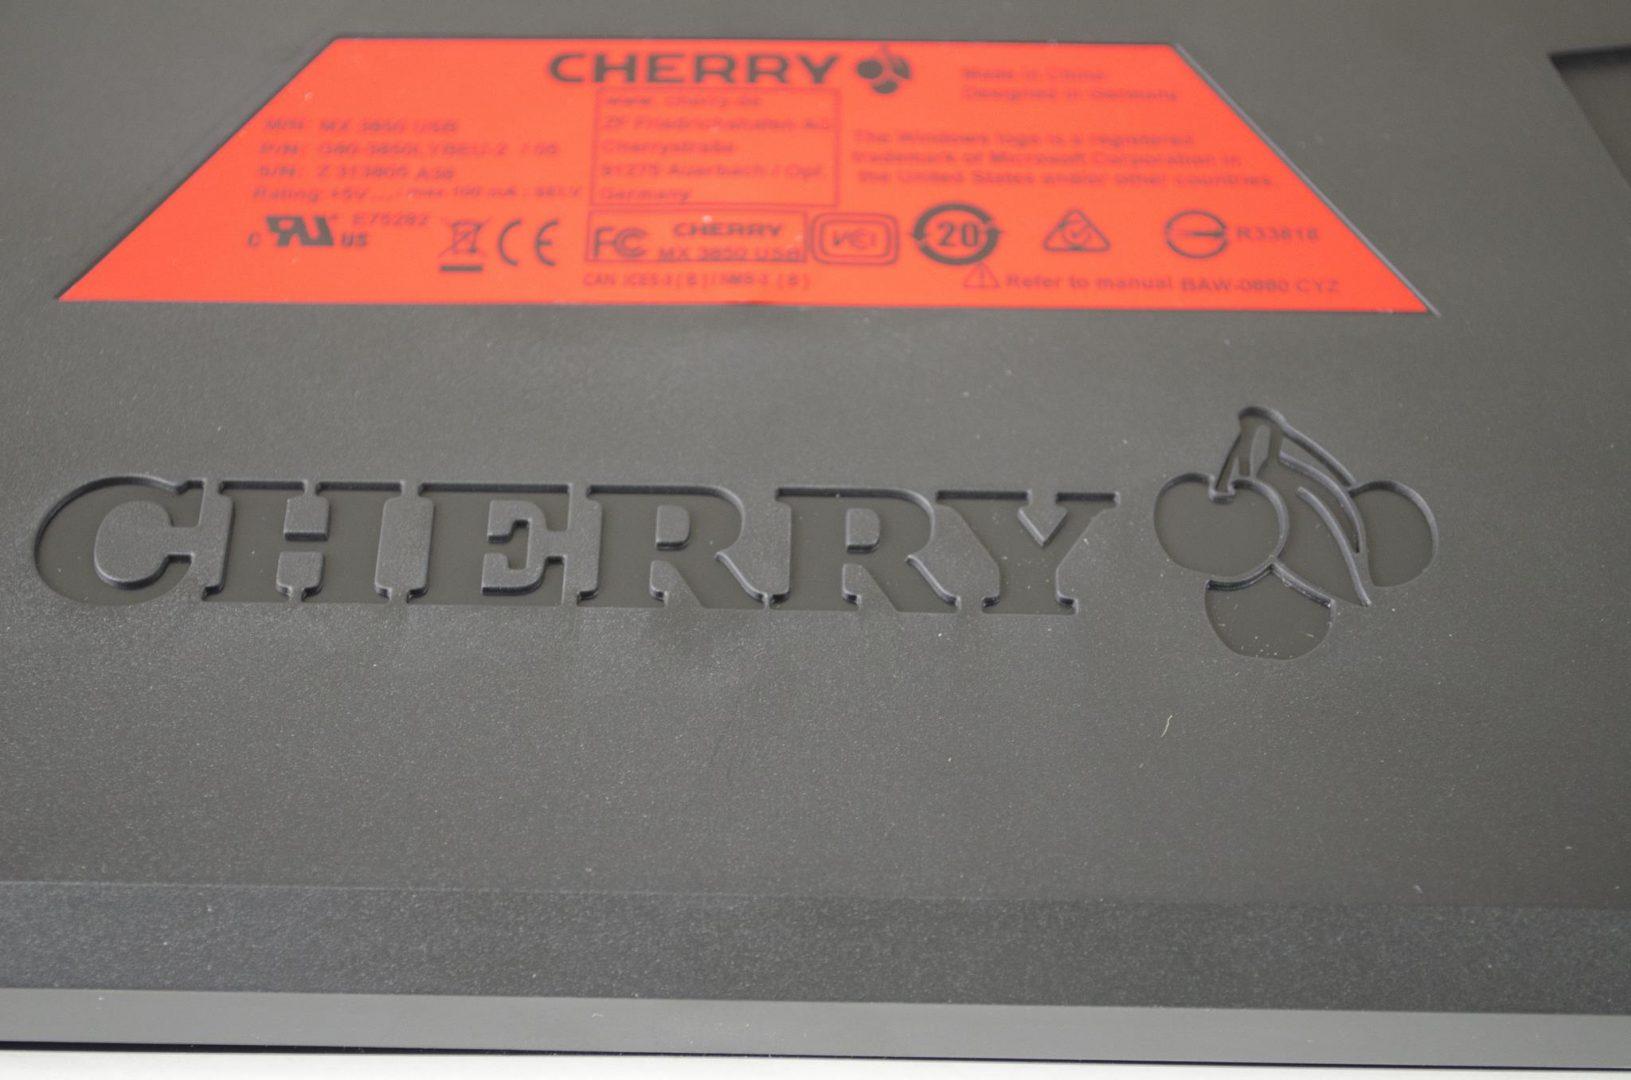 Cherry MX Board 3_7